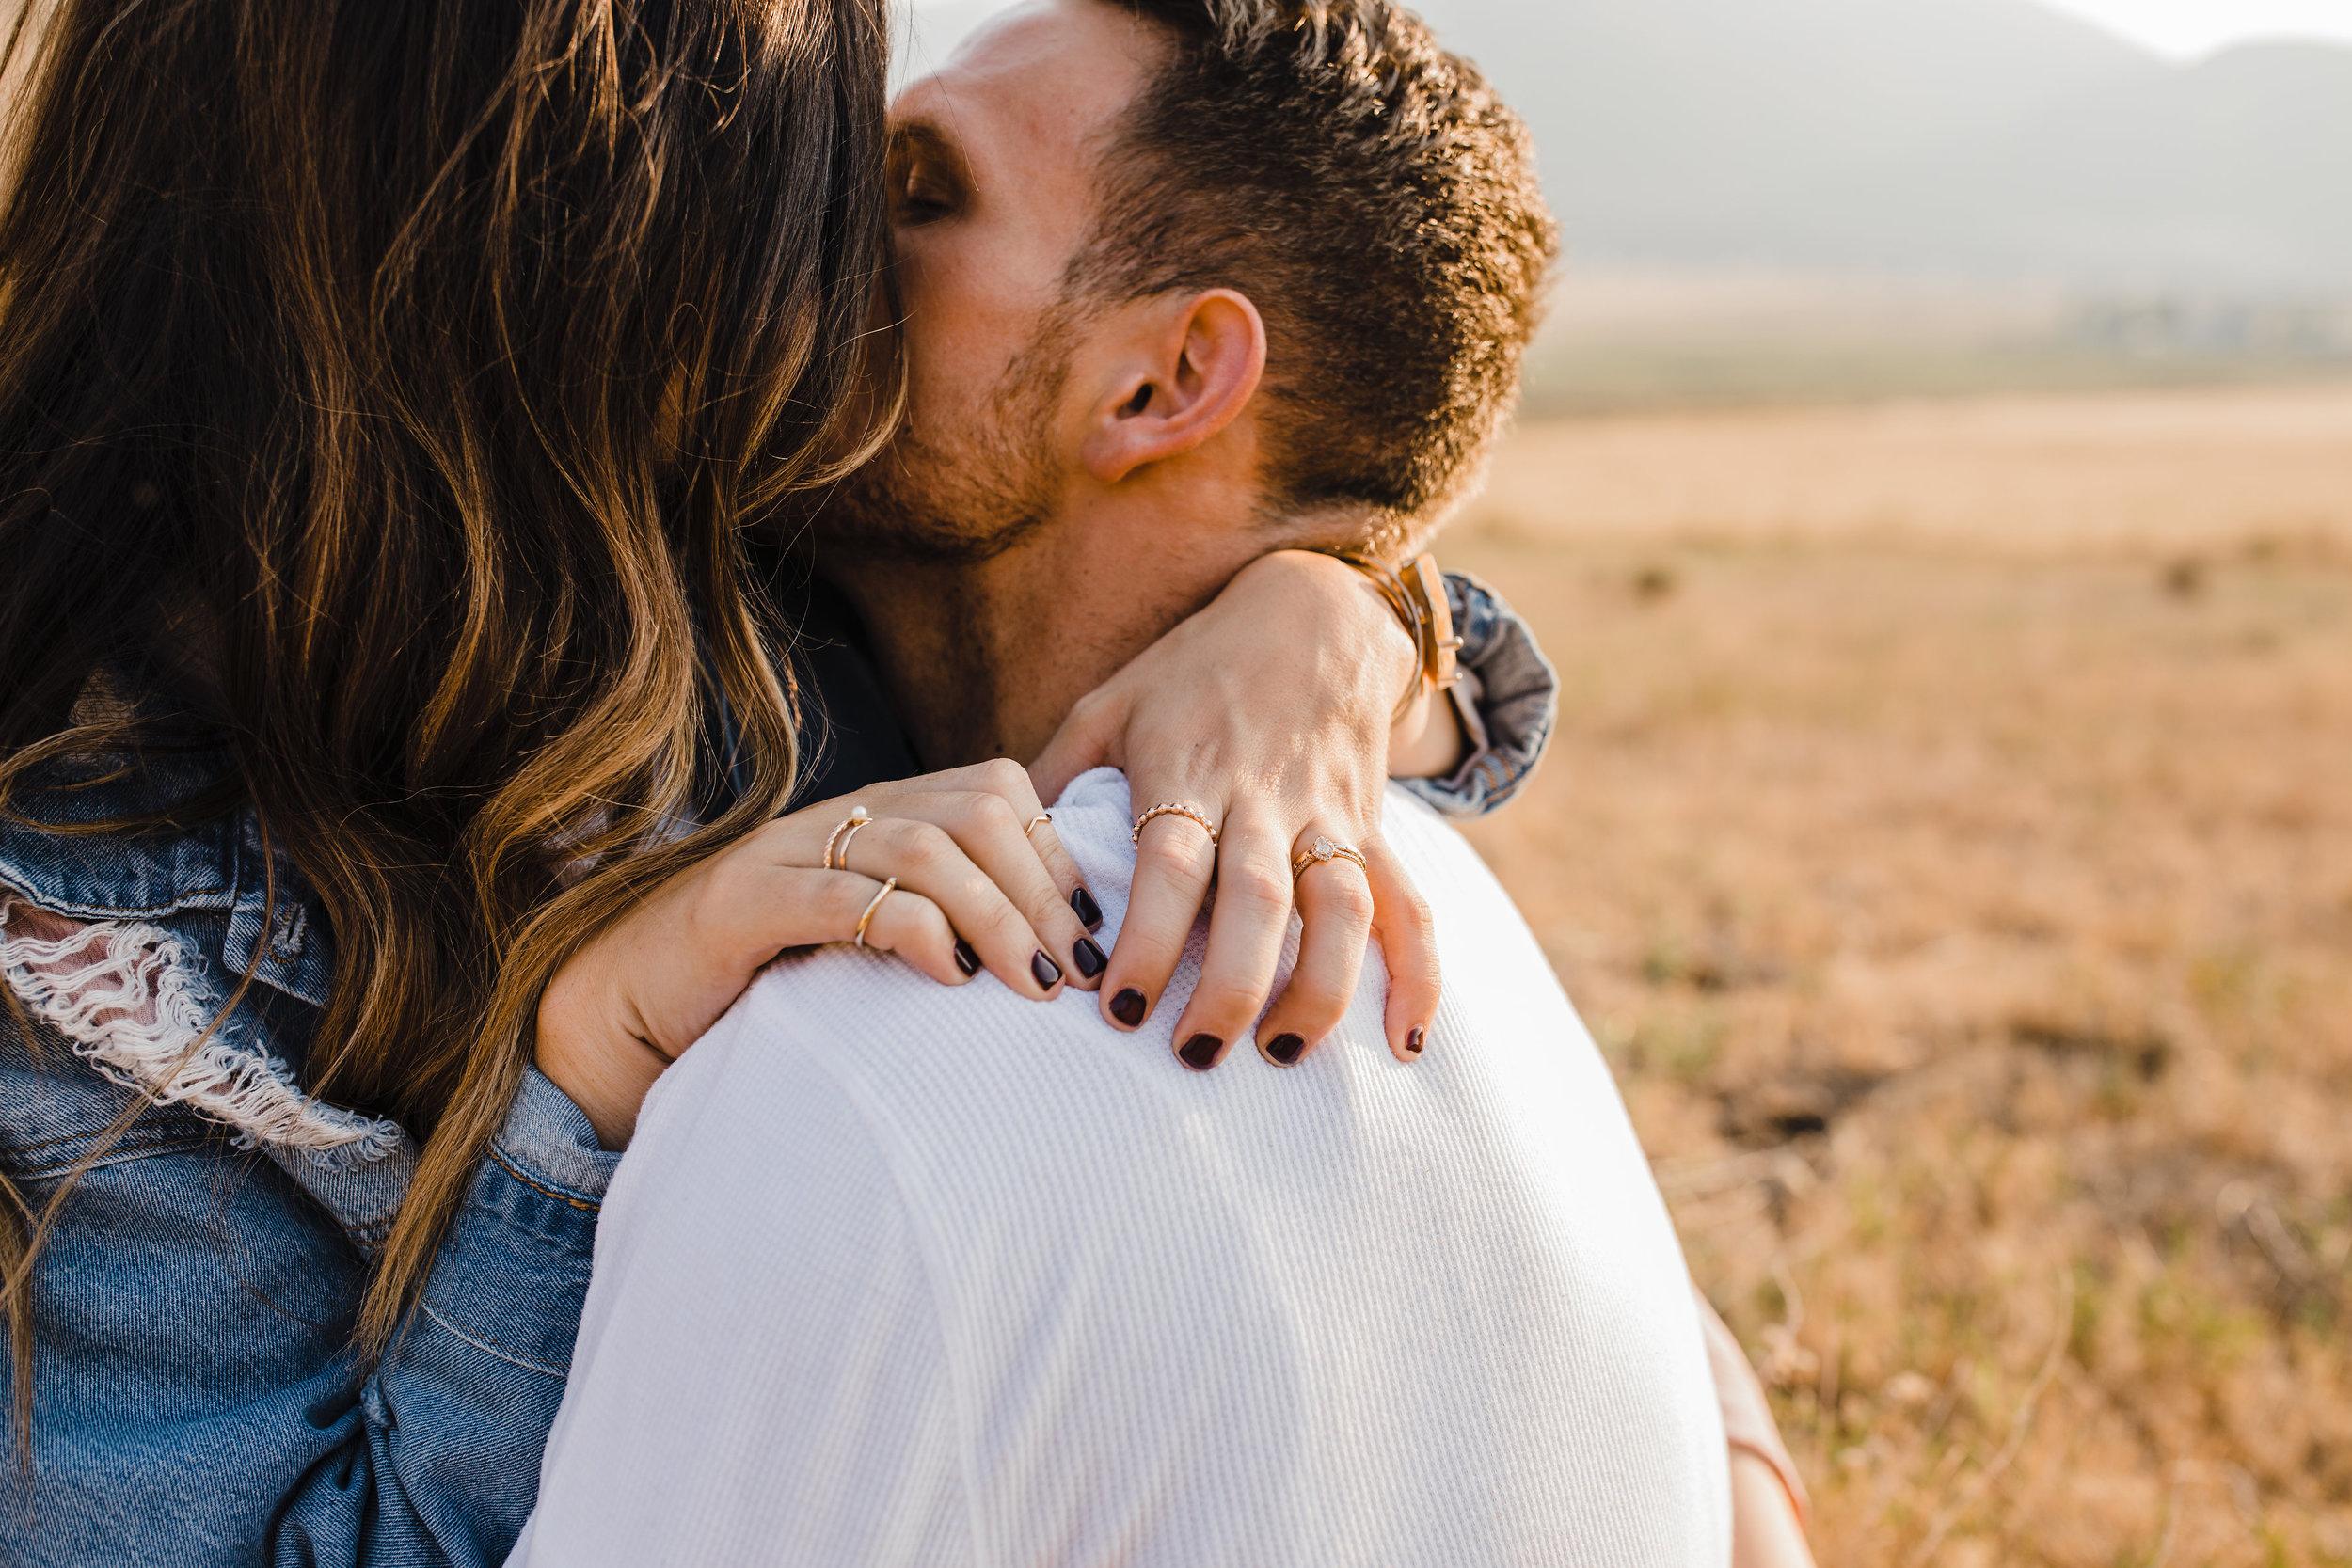 professional mantua utah couples photographer hugging rings black finger nails